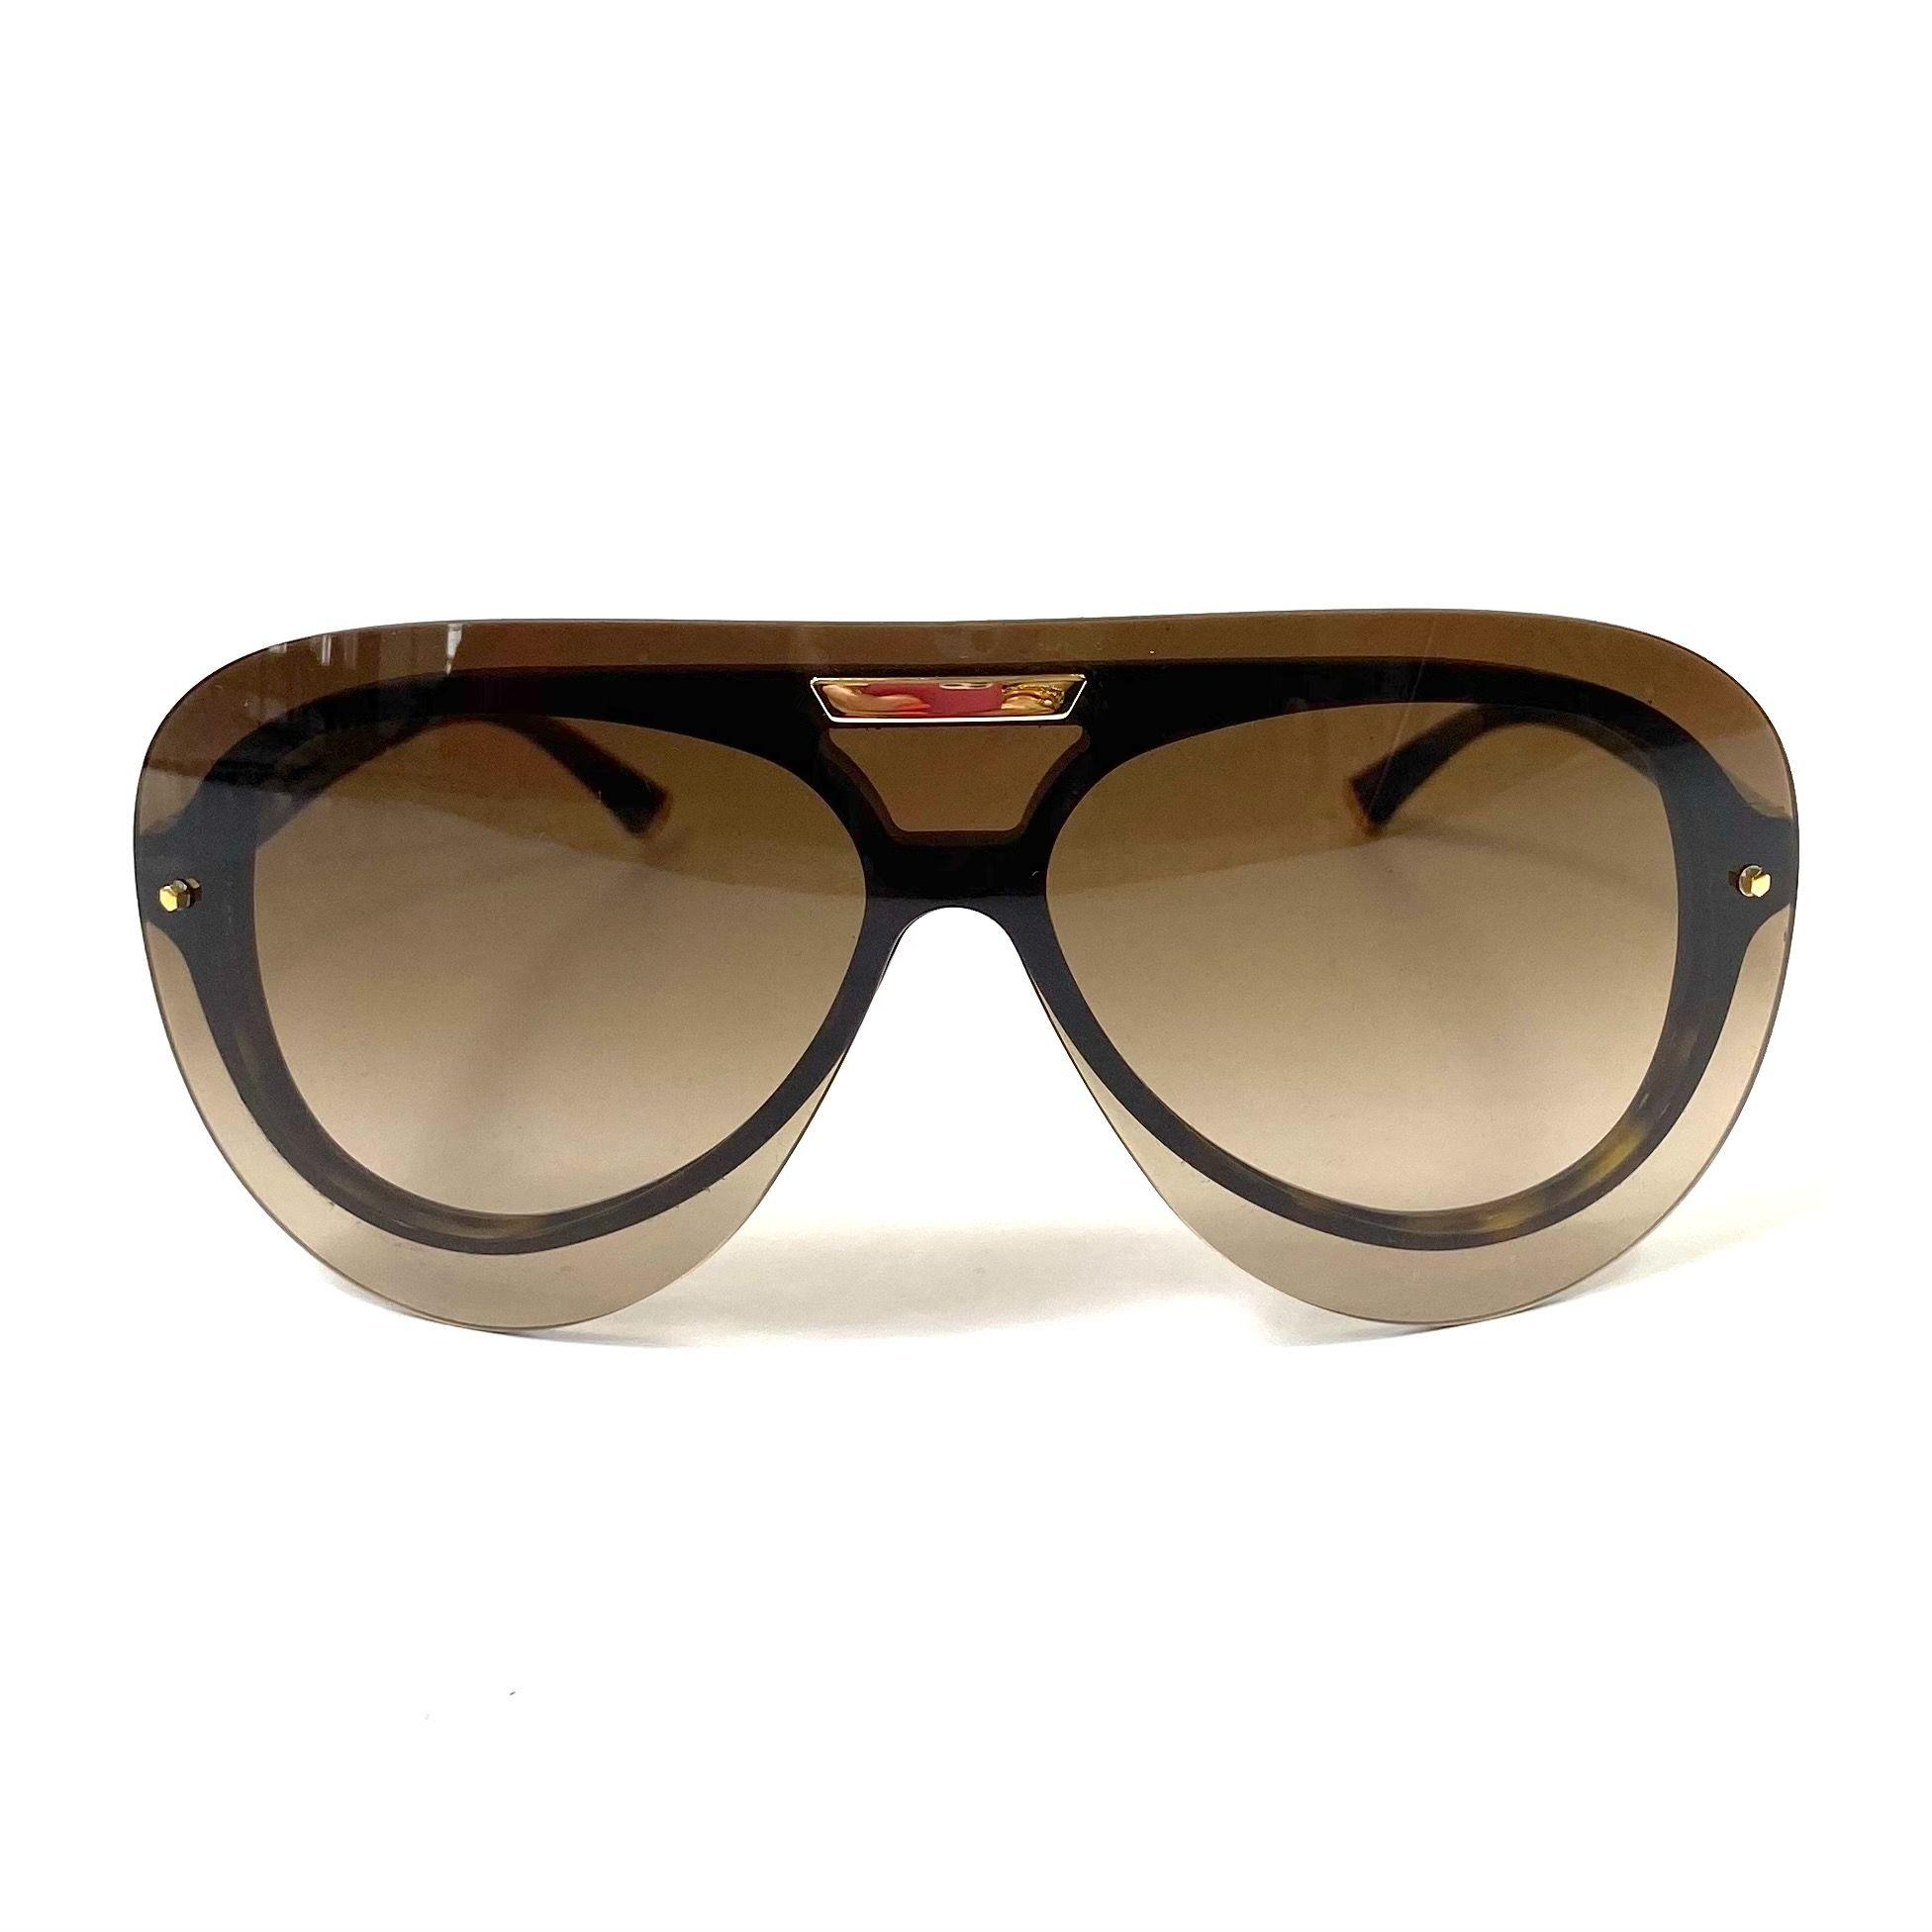 Óculos Dolce&Gabbana DG 4090 Marrom